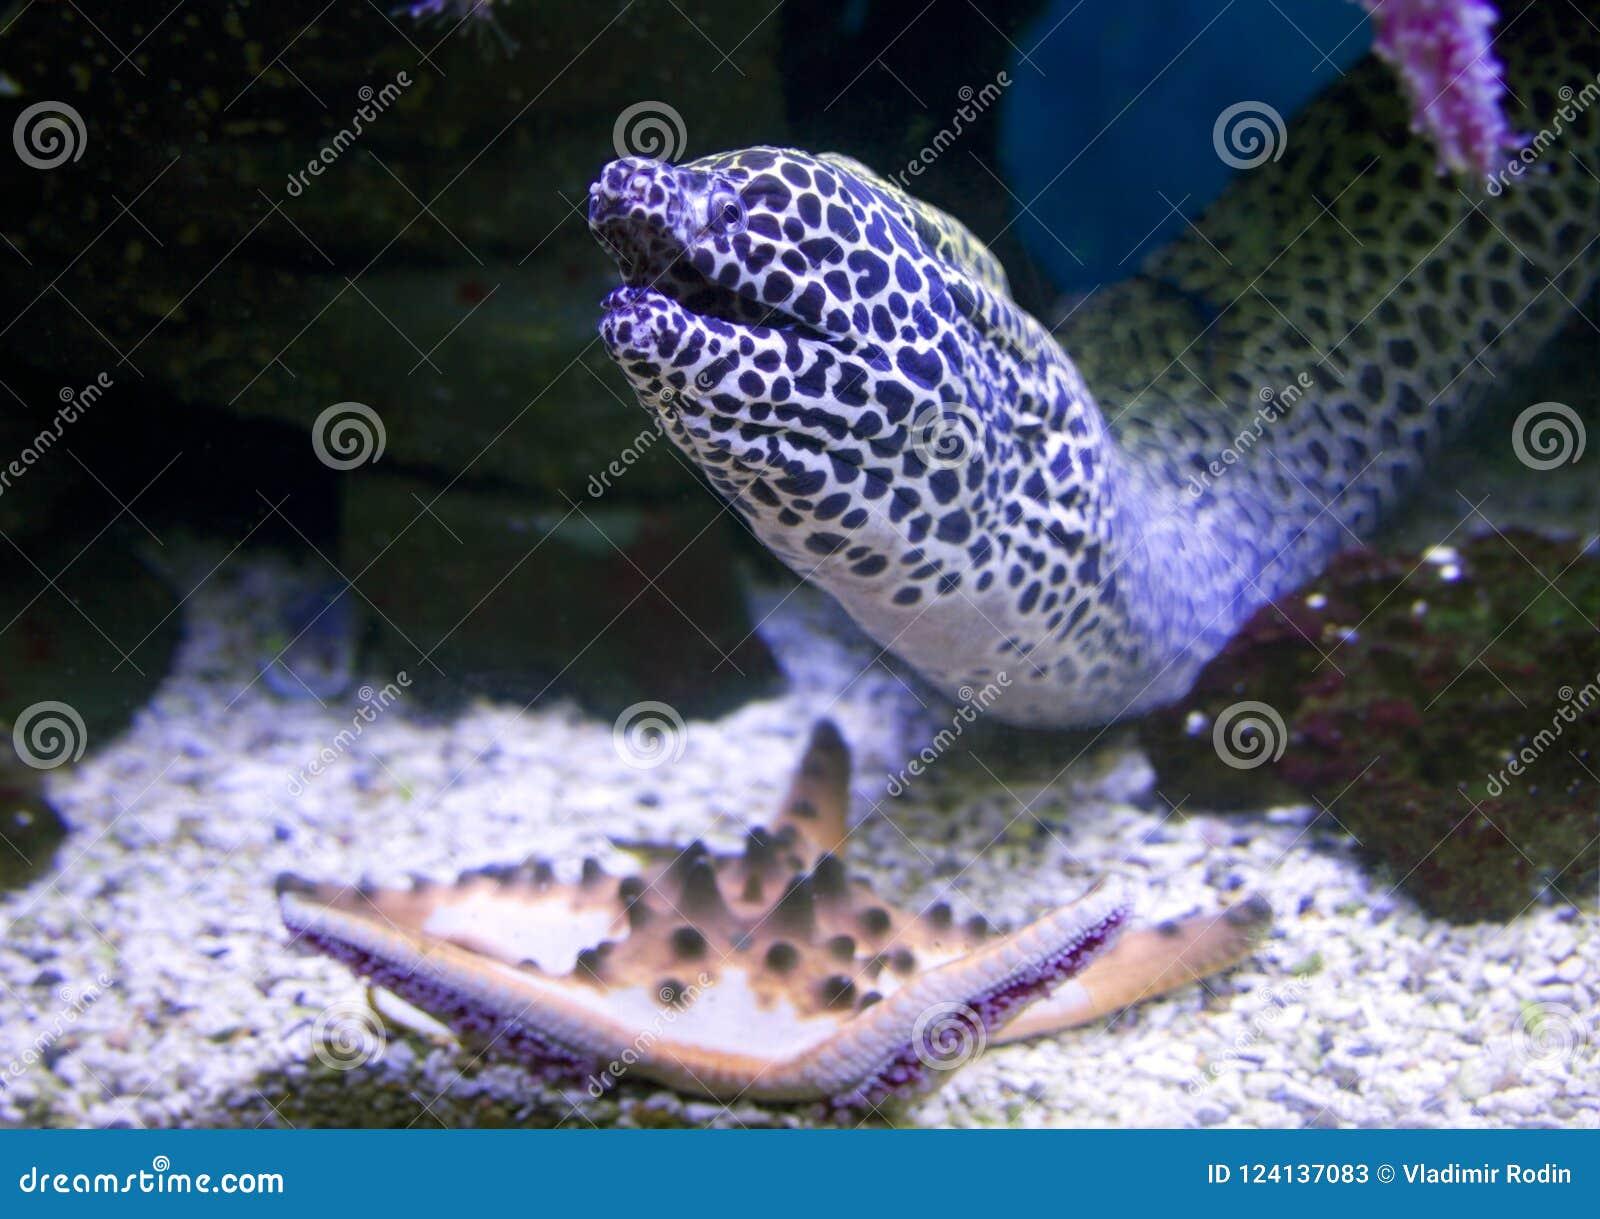 Snake Wire Mesh Fish Predator Tropical Coral Reefs Aggressive